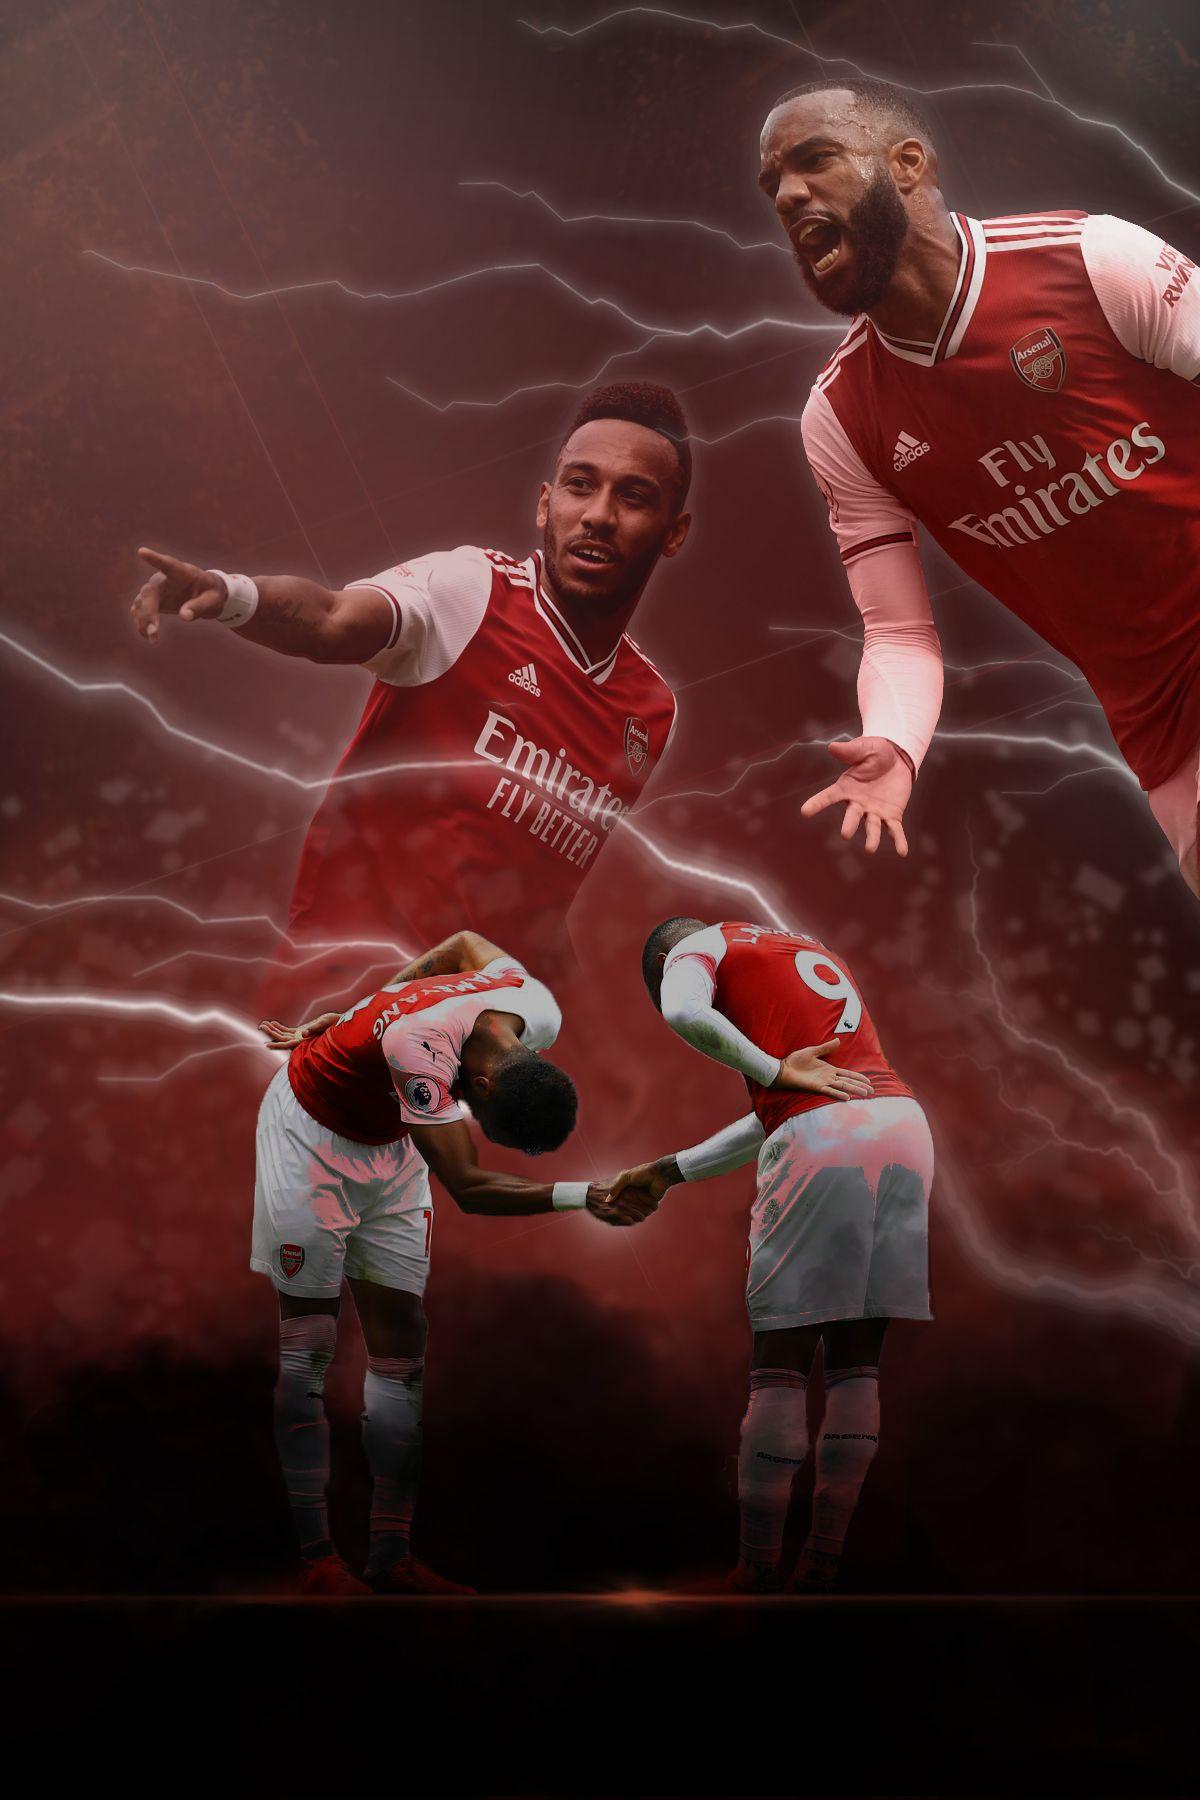 Pin On Arsenal Fc Players